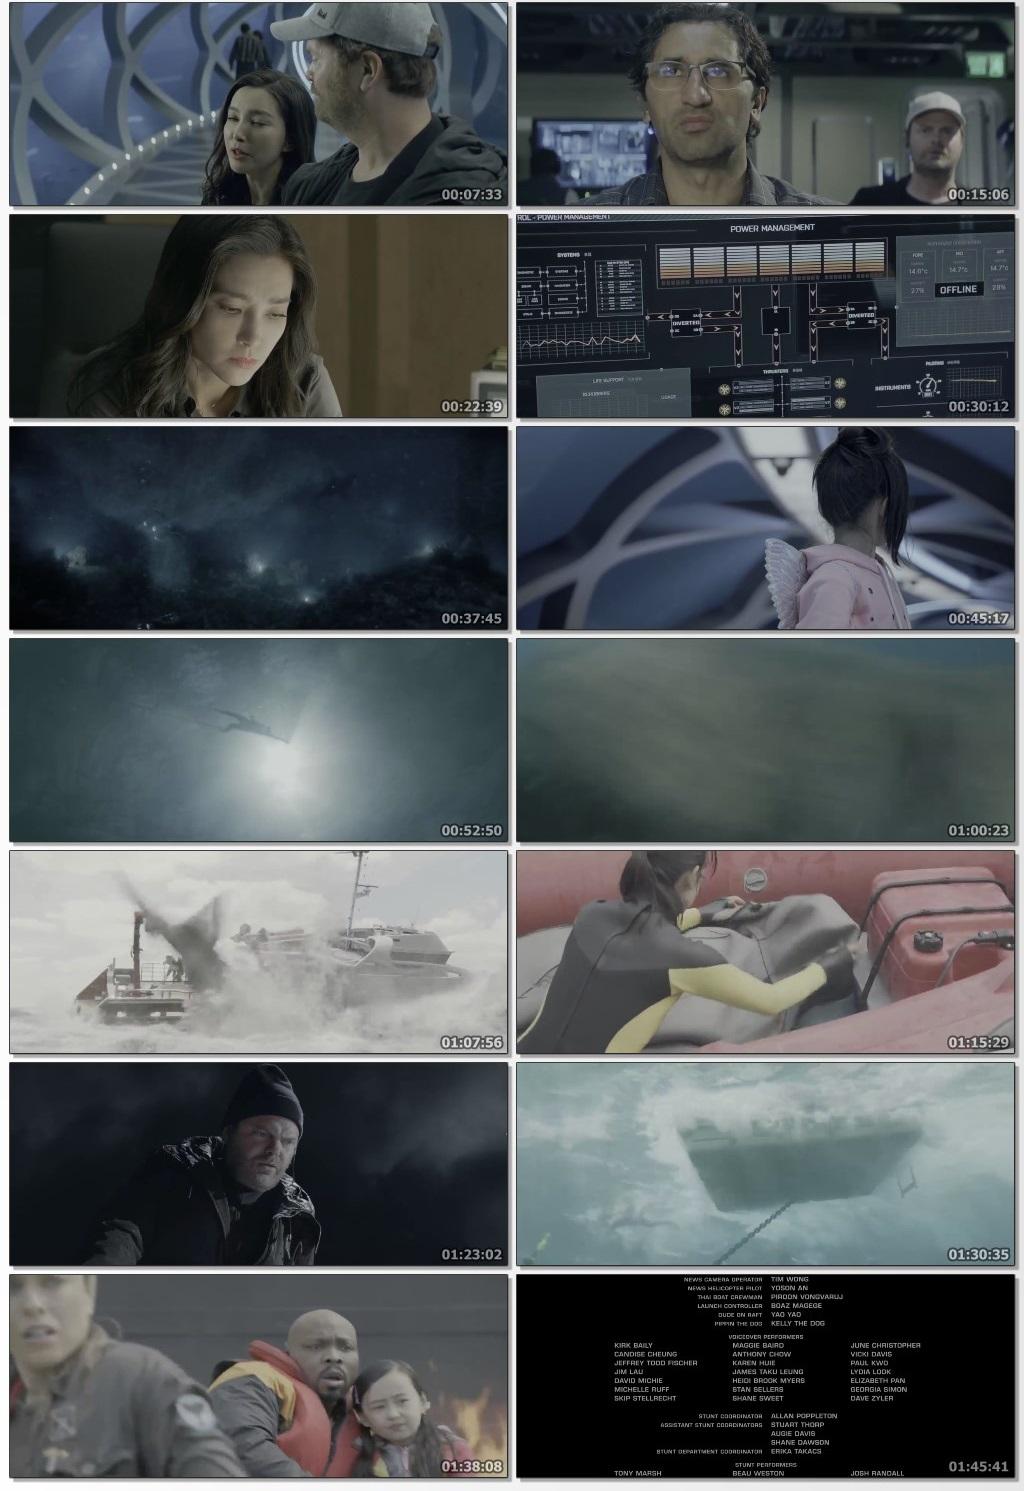 The-Meg-2018-www-9kmovies-cool-Hindi-Dual-Audio-720p-Blu-Ray-ESub-800-MB-mkv-thumbs